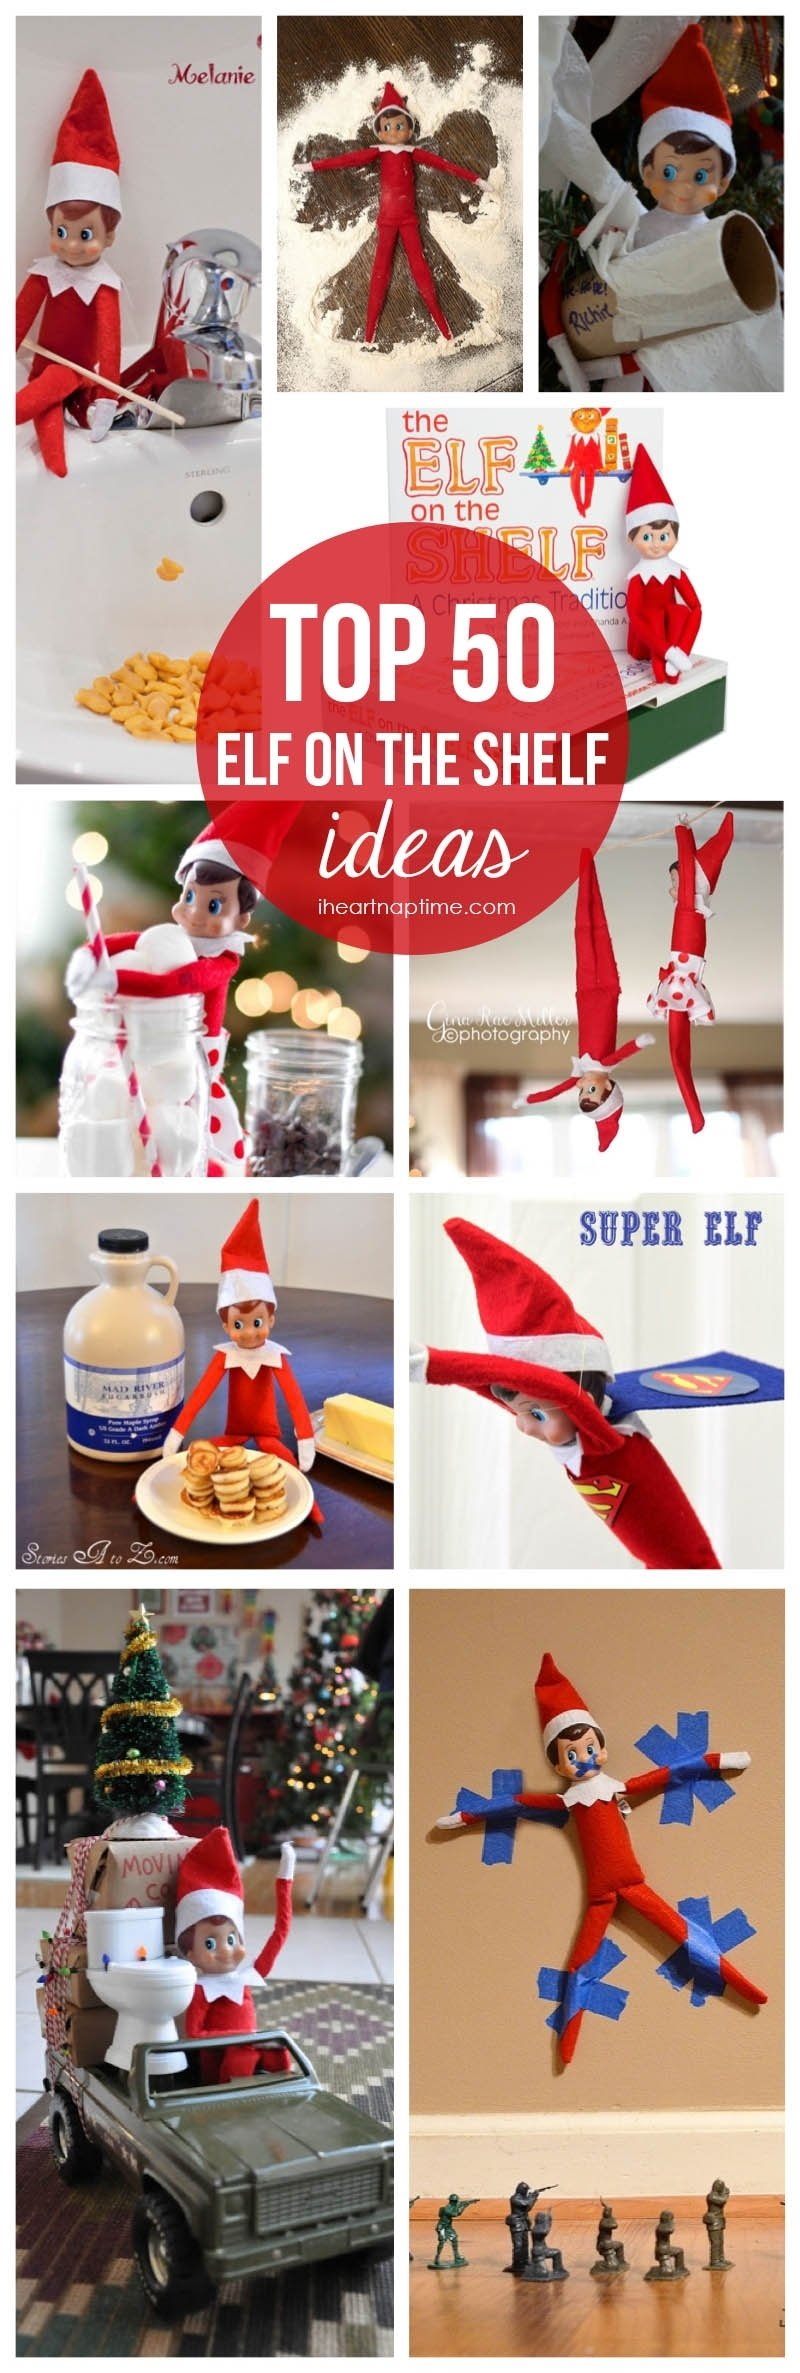 10 Ideal Good Ideas For Elf On The Shelf top 50 elf on the shelf ideas i heart nap time 3 2021